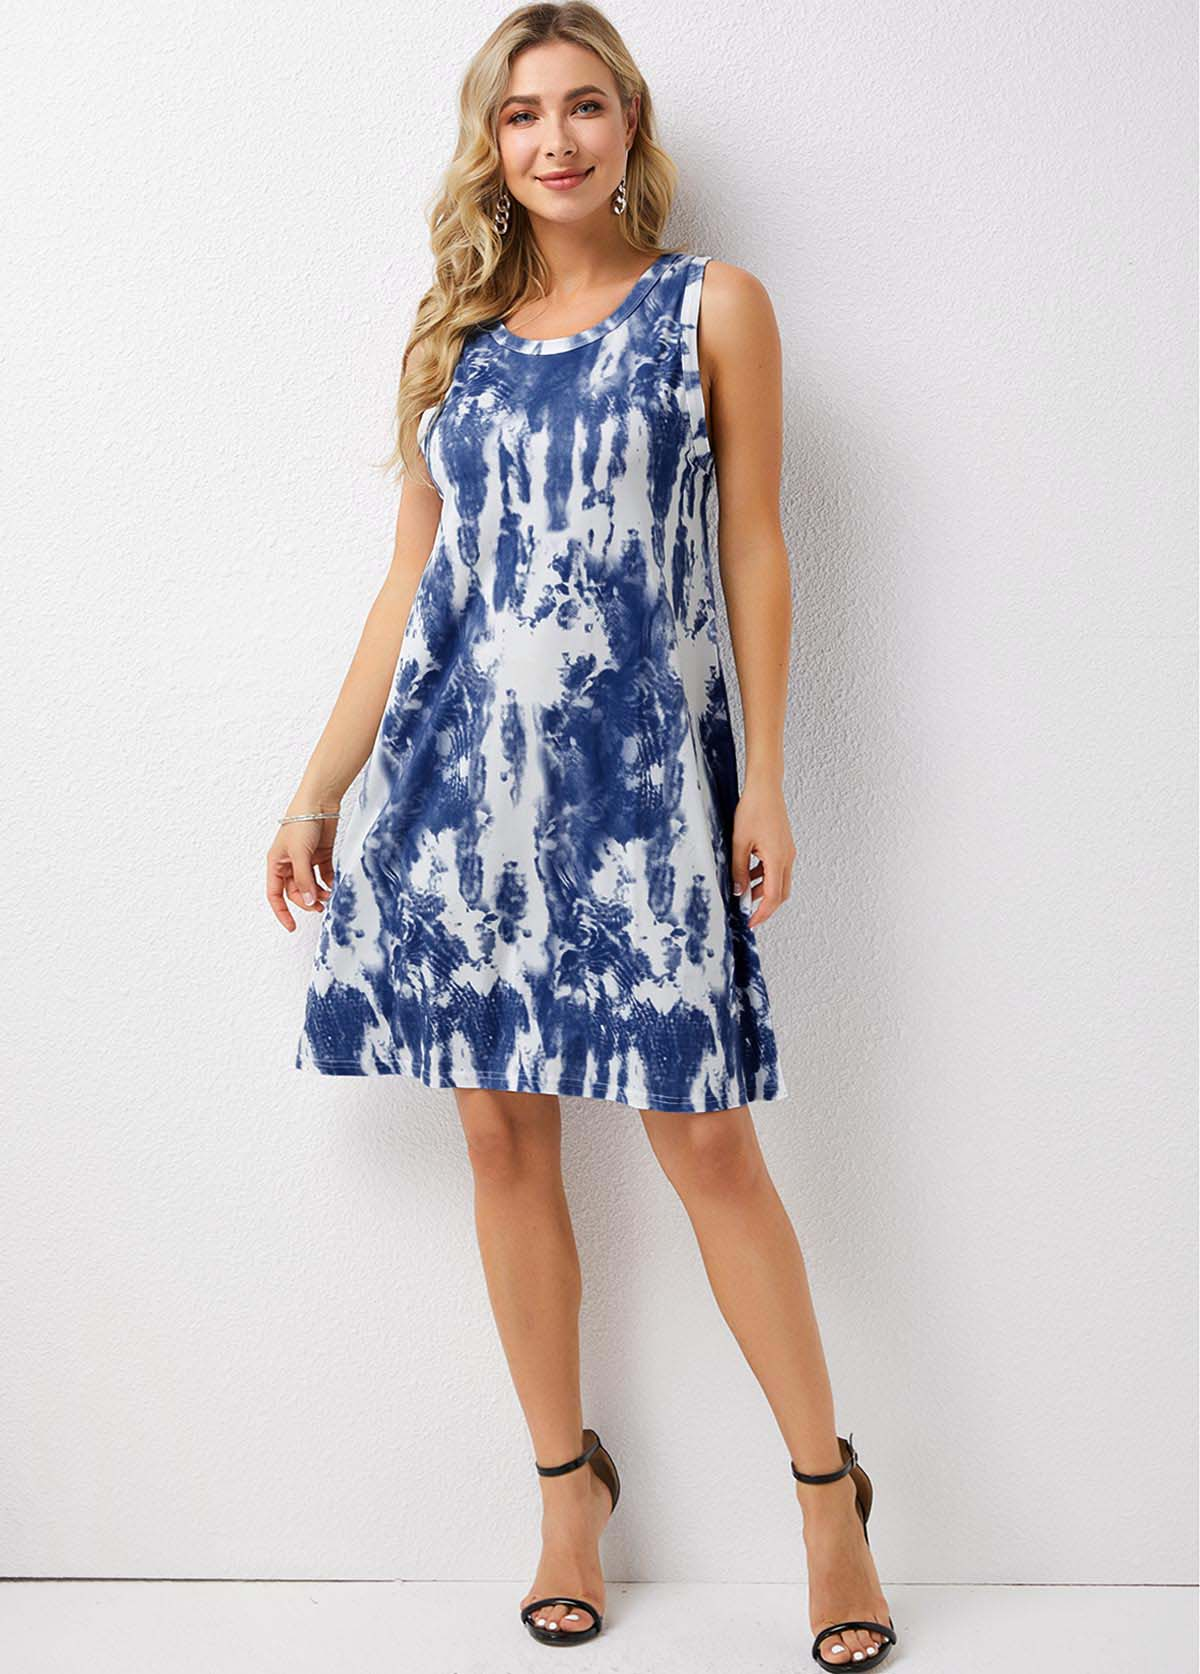 Sleeveless Tie Dye Print Round Neck Dress